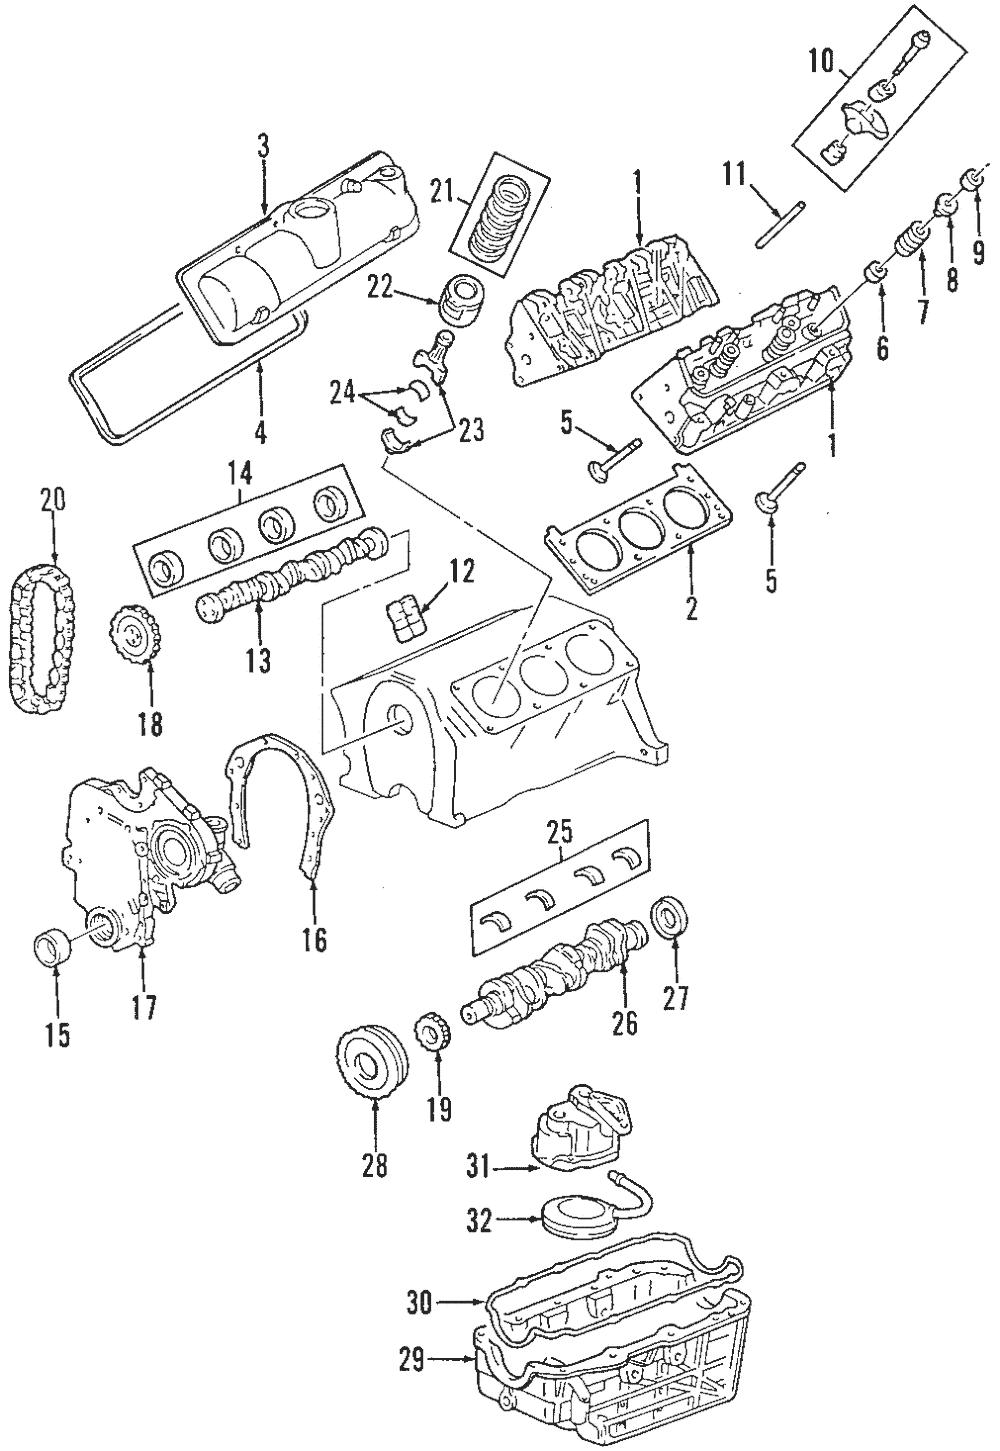 OEM NEW 2005-2007 GM Chevrolet Pontiac Head Gasket Engine